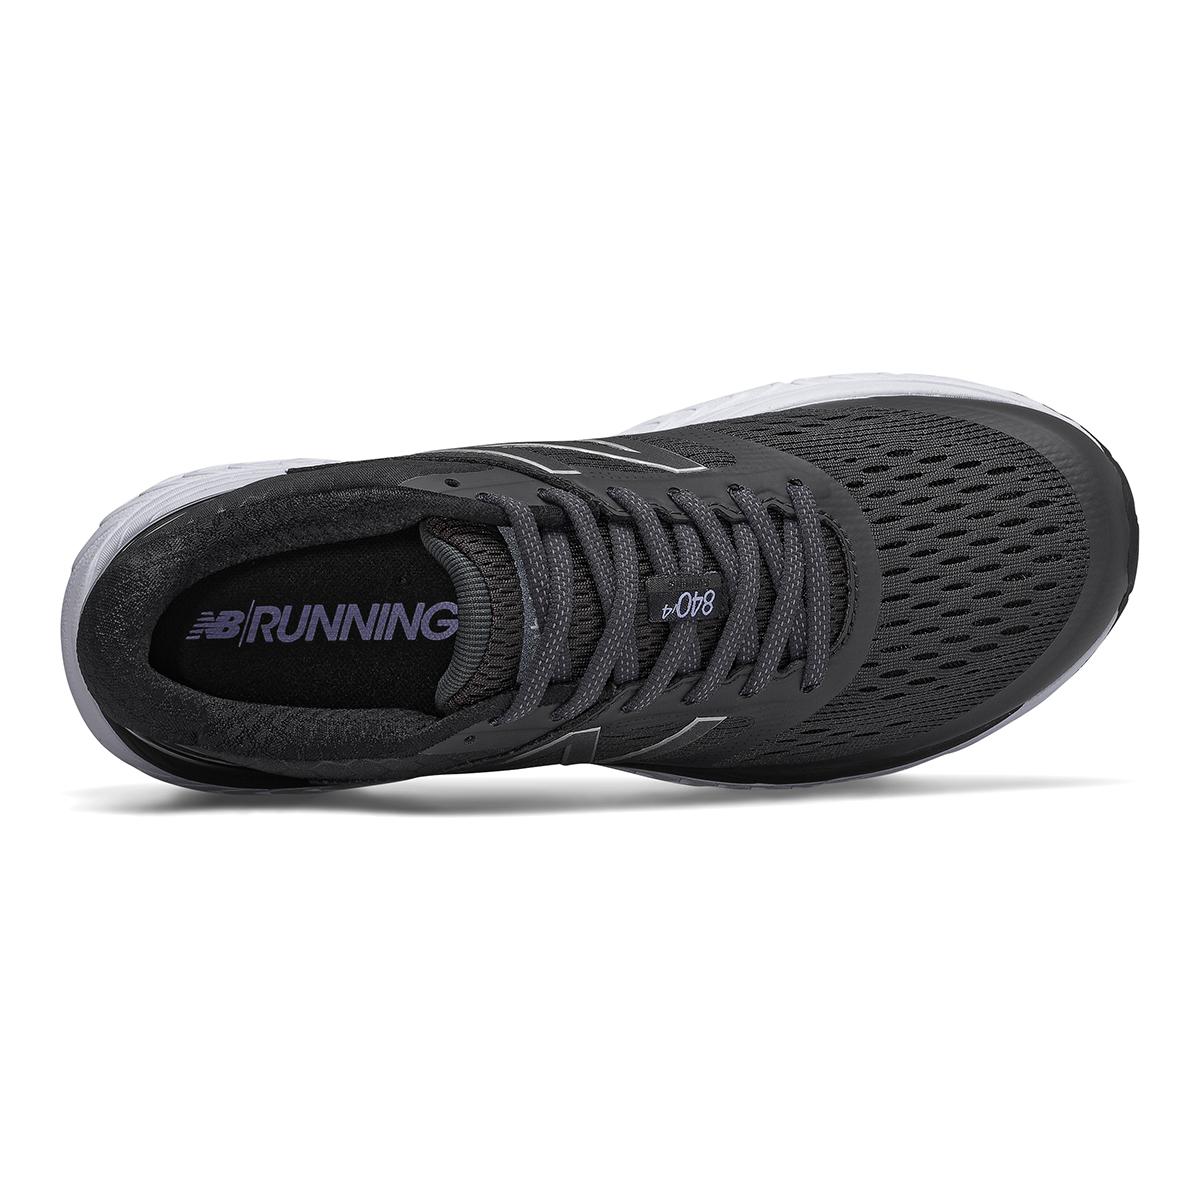 Women's New Balance 840V4 Walking Shoe - Color: Black - Size: 5 - Width: Narrow, Black, large, image 3